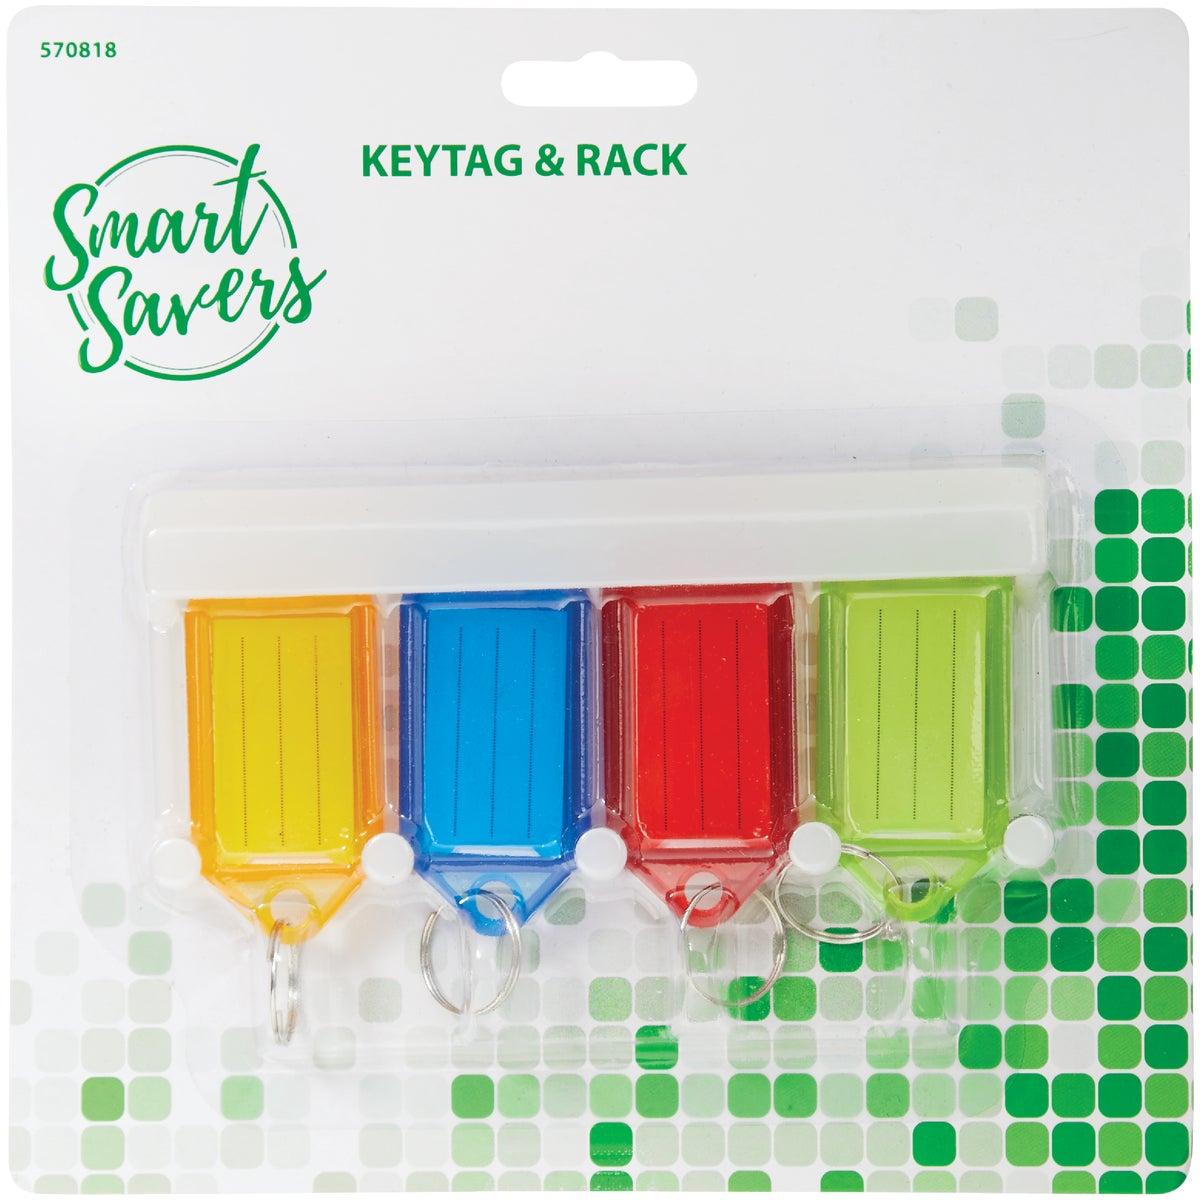 KEYTAG & RACK - FK071 by Do it Best